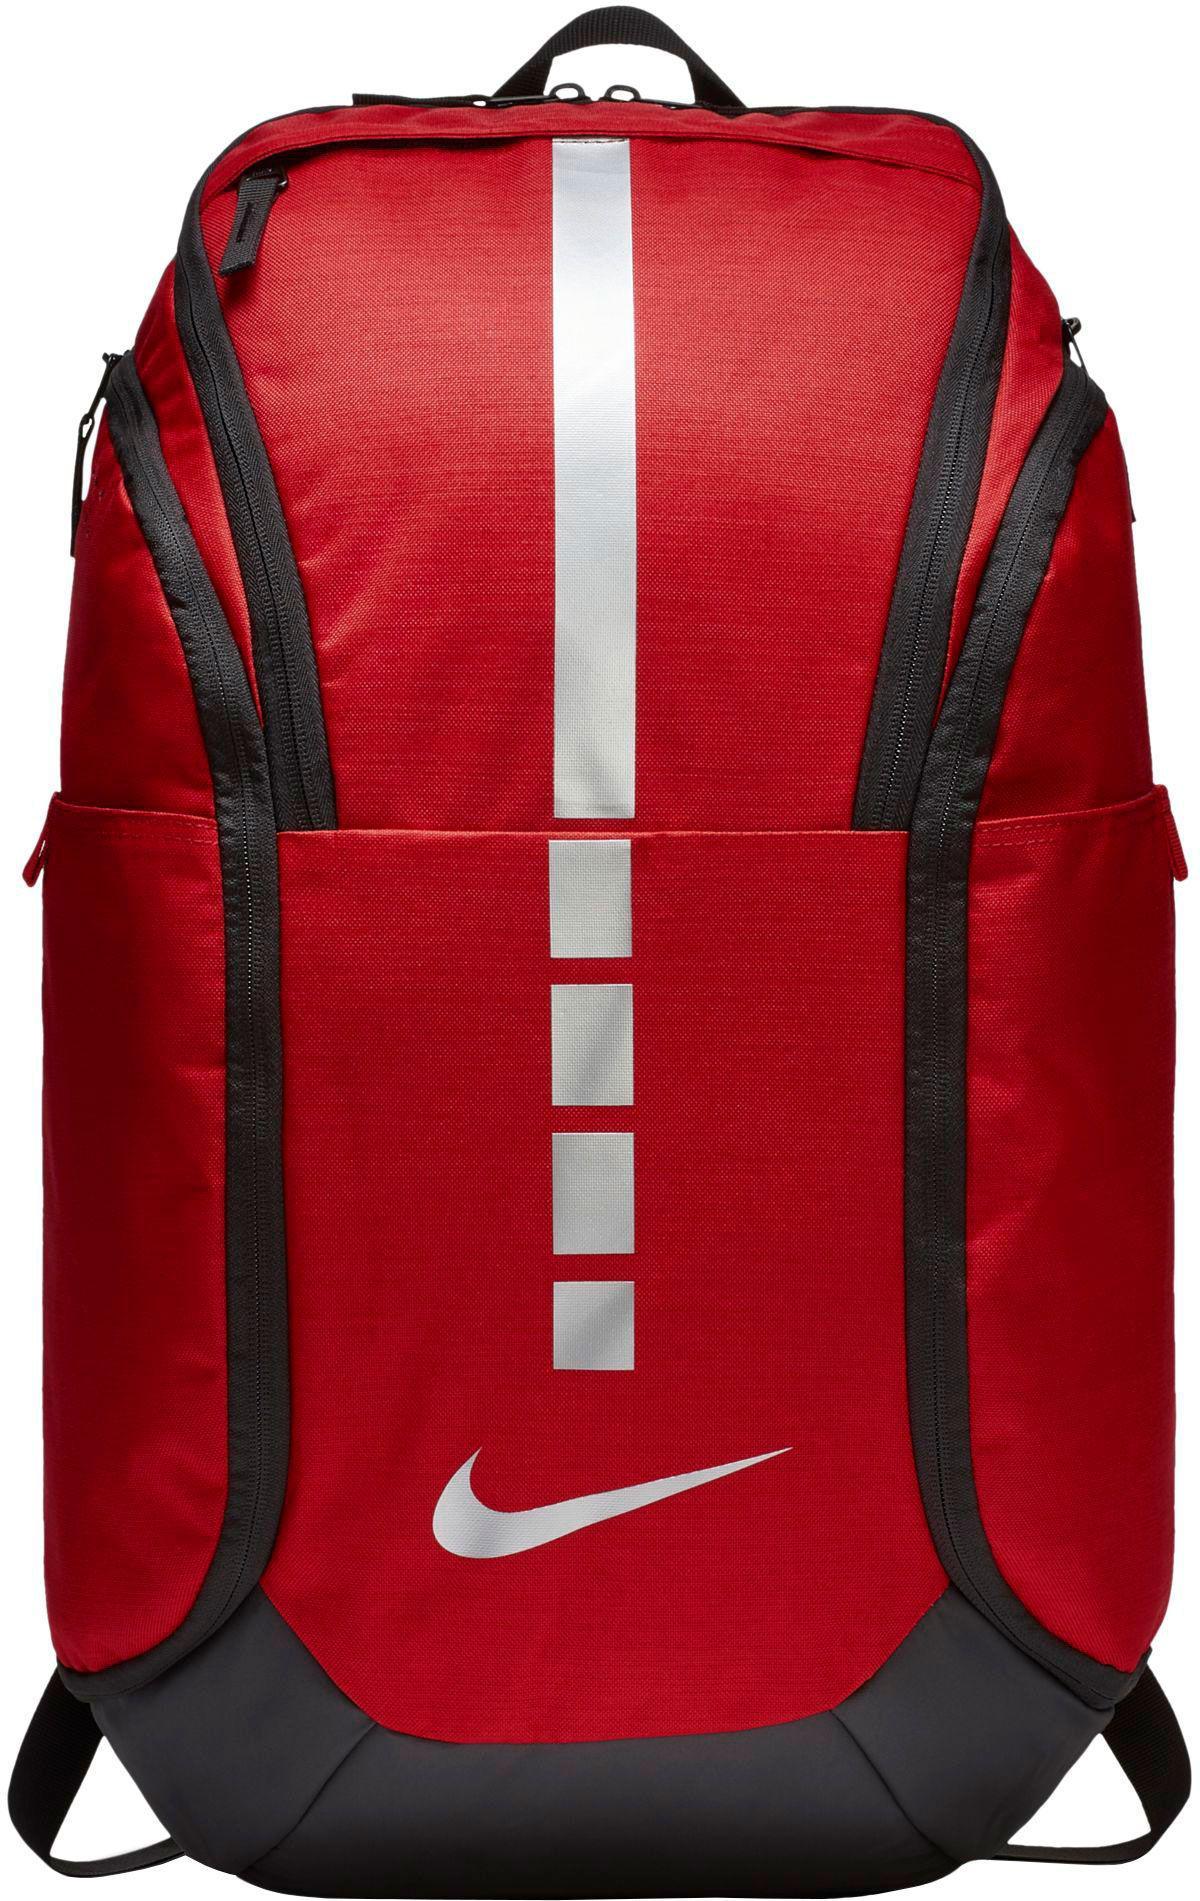 5ec5b875f6 Lyst - Nike Hoops Elite Pro Basketball Backpack in Red for Men